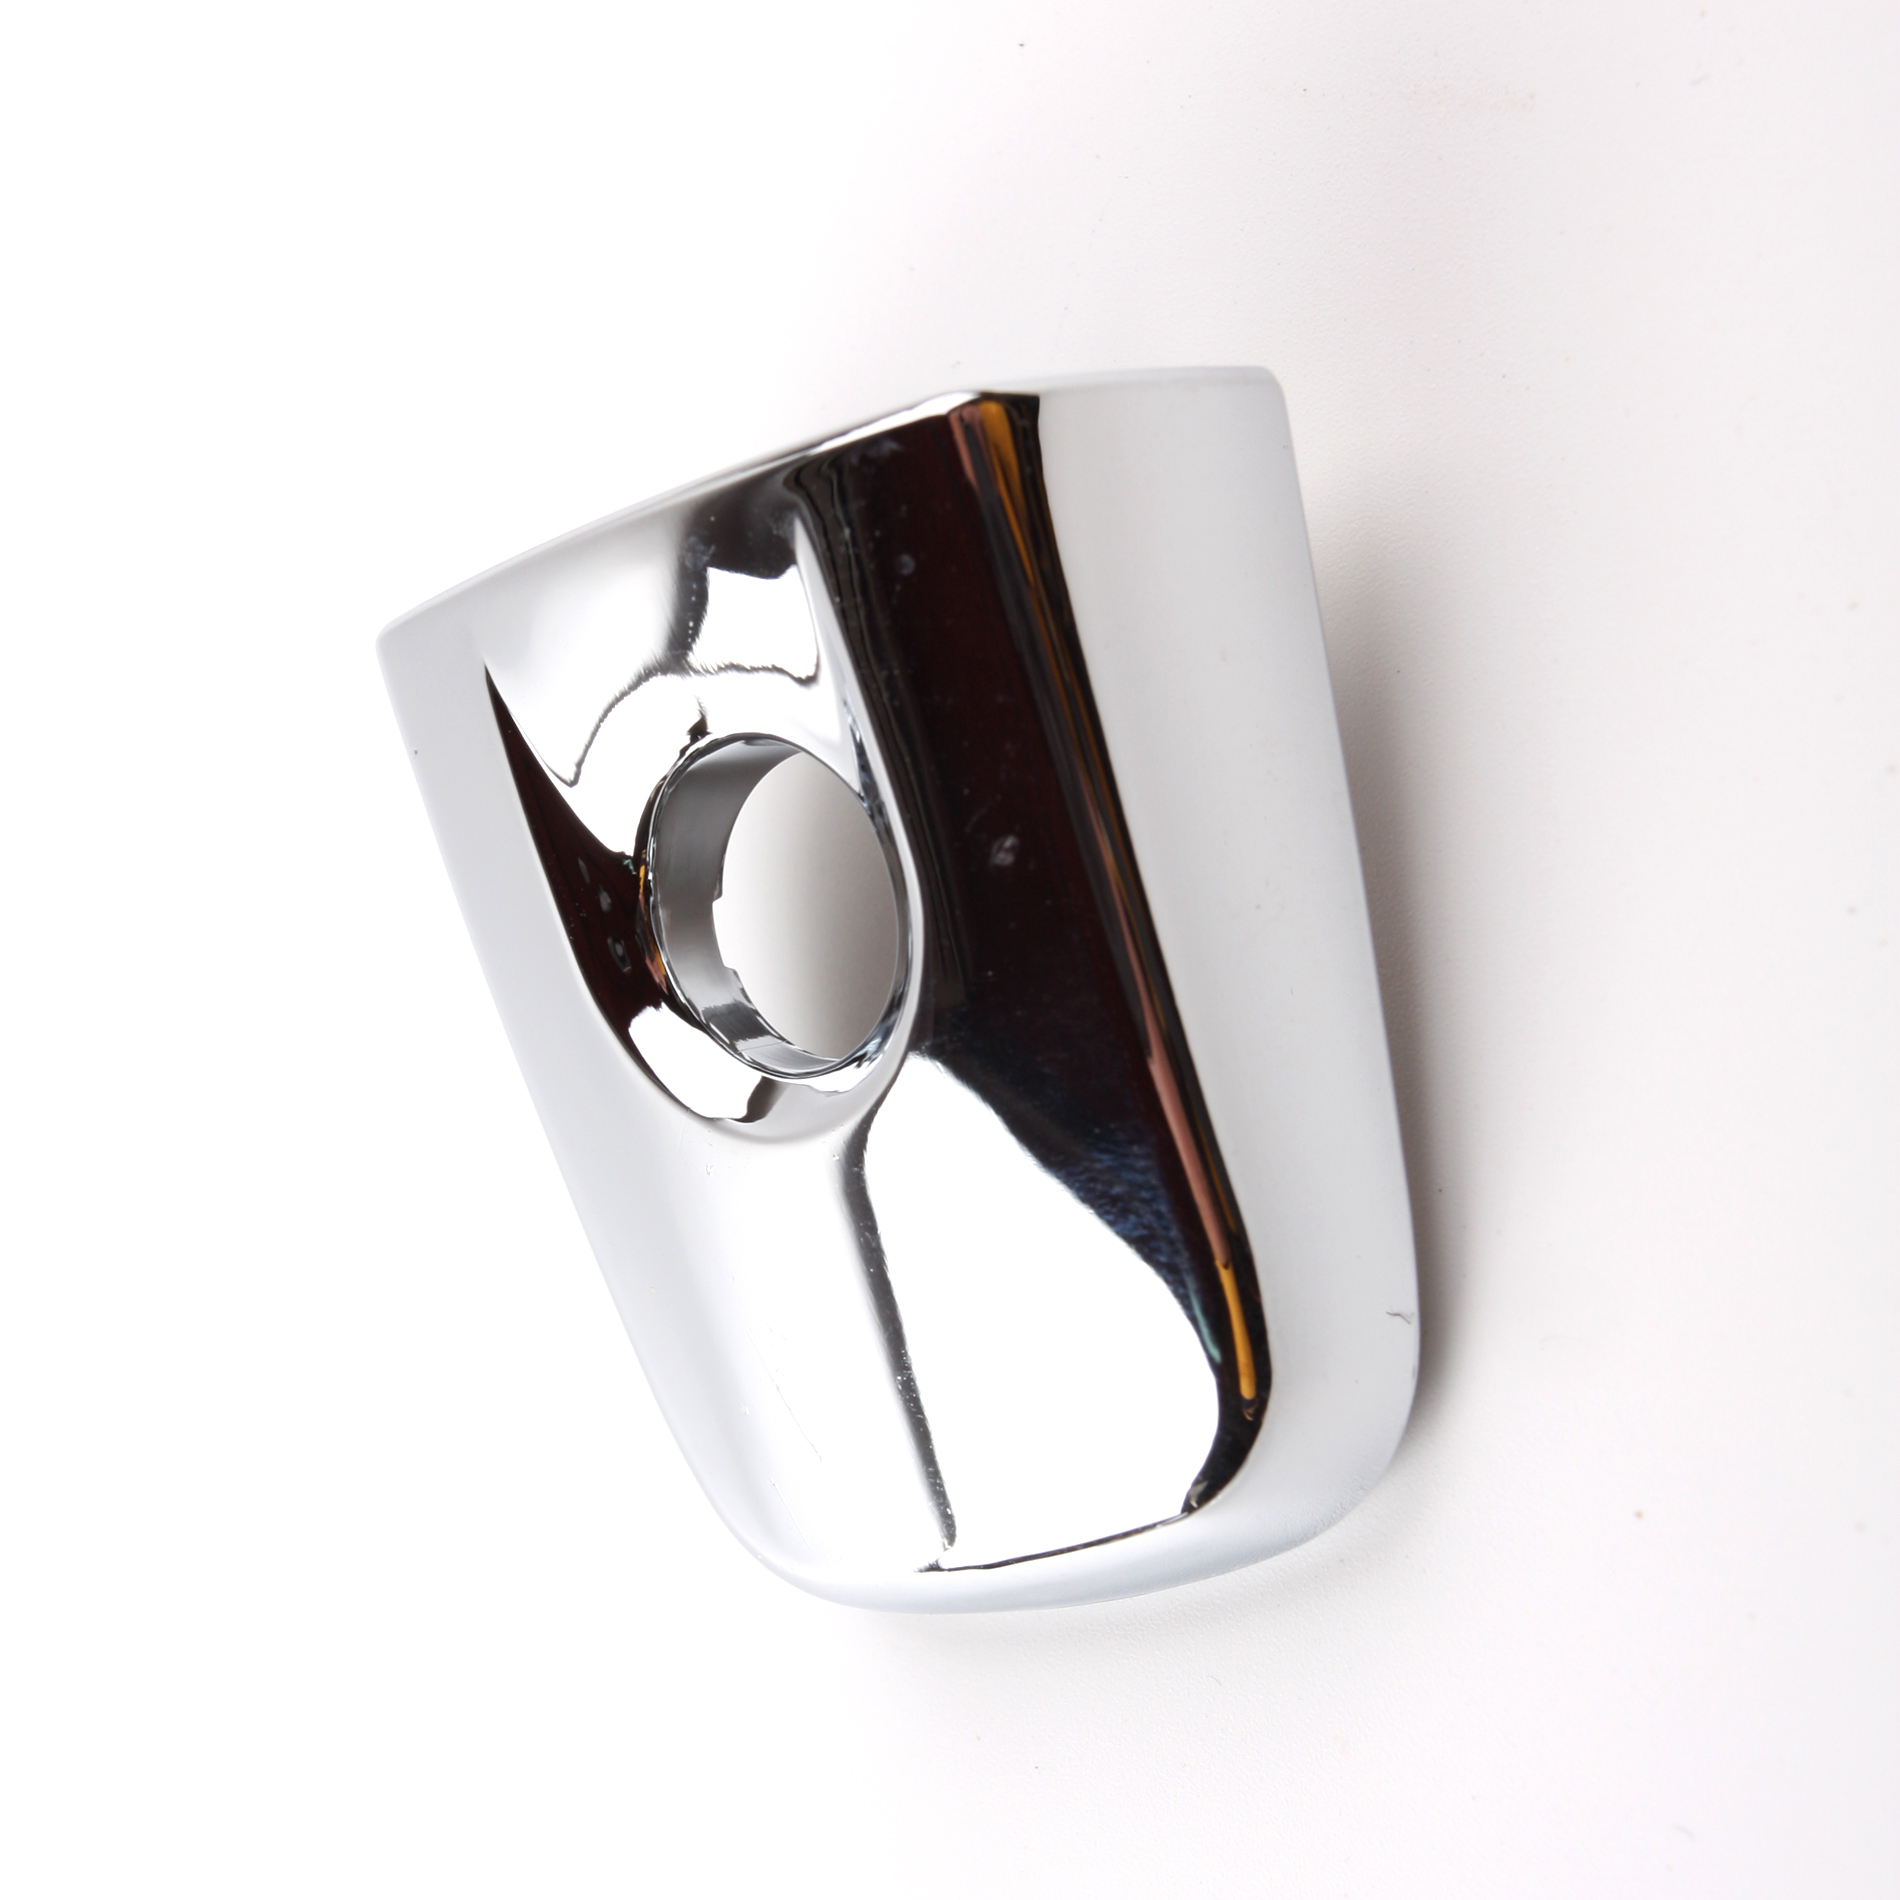 For Altima Pathfinder Front Left LH Chrome Door Handle Cap Escutcheon W//KeyHole